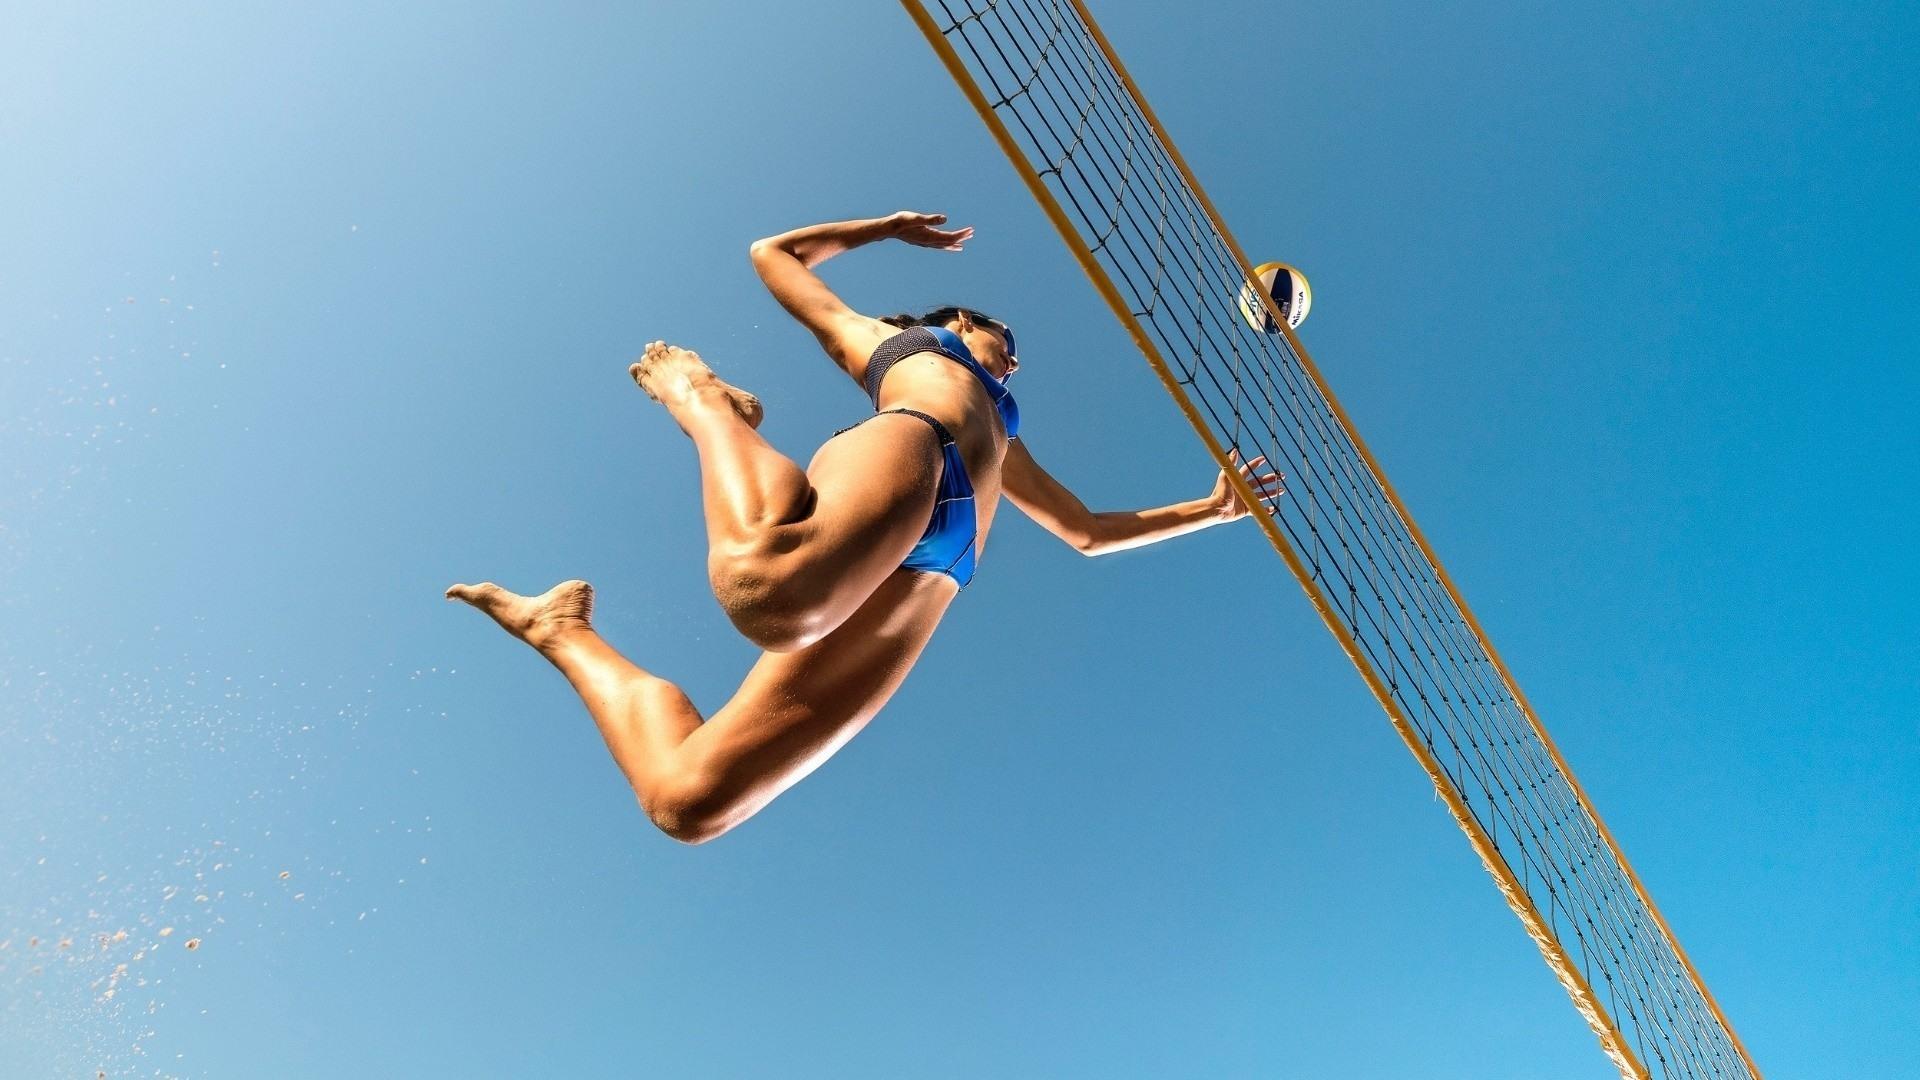 Фото Девушка в бикини, прыжок, волейбол, мяч, удар, сетка, ножки, небо, скачать картинку бесплатно